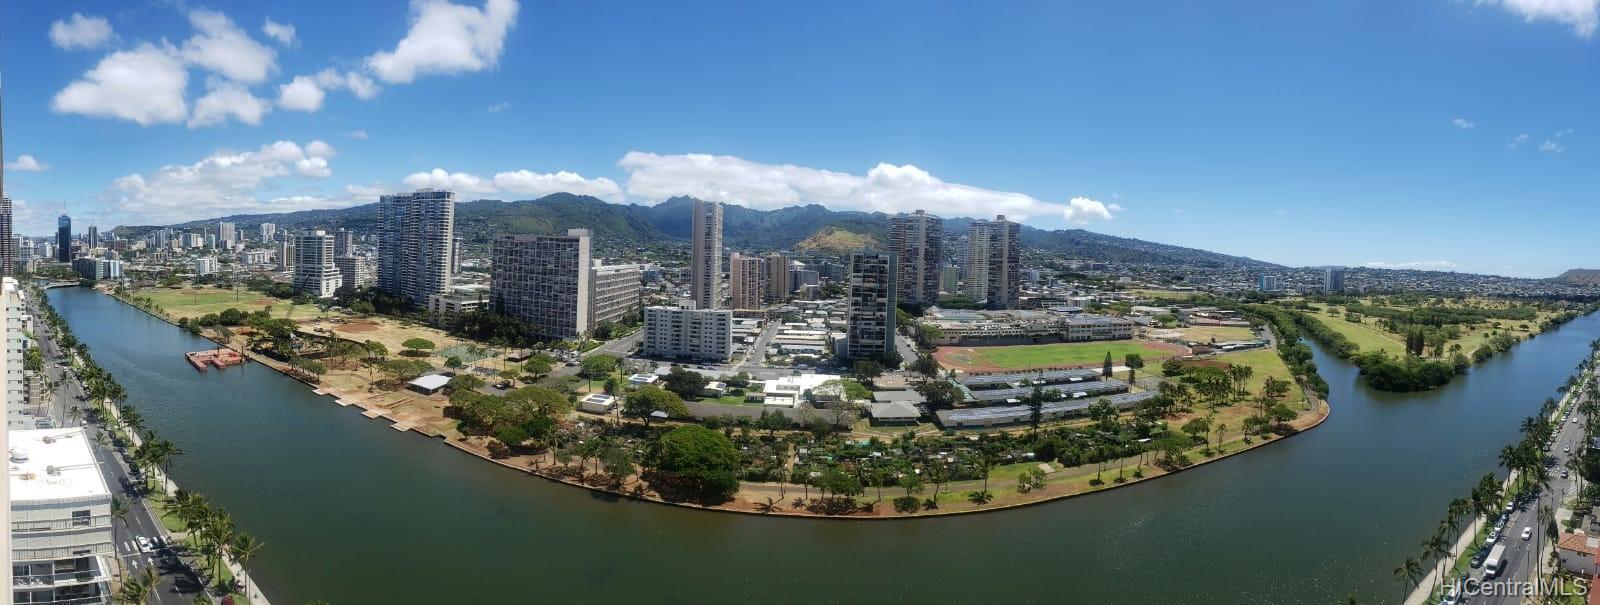 2121 ALA WAI condo # 2602, Honolulu, Hawaii - photo 1 of 6